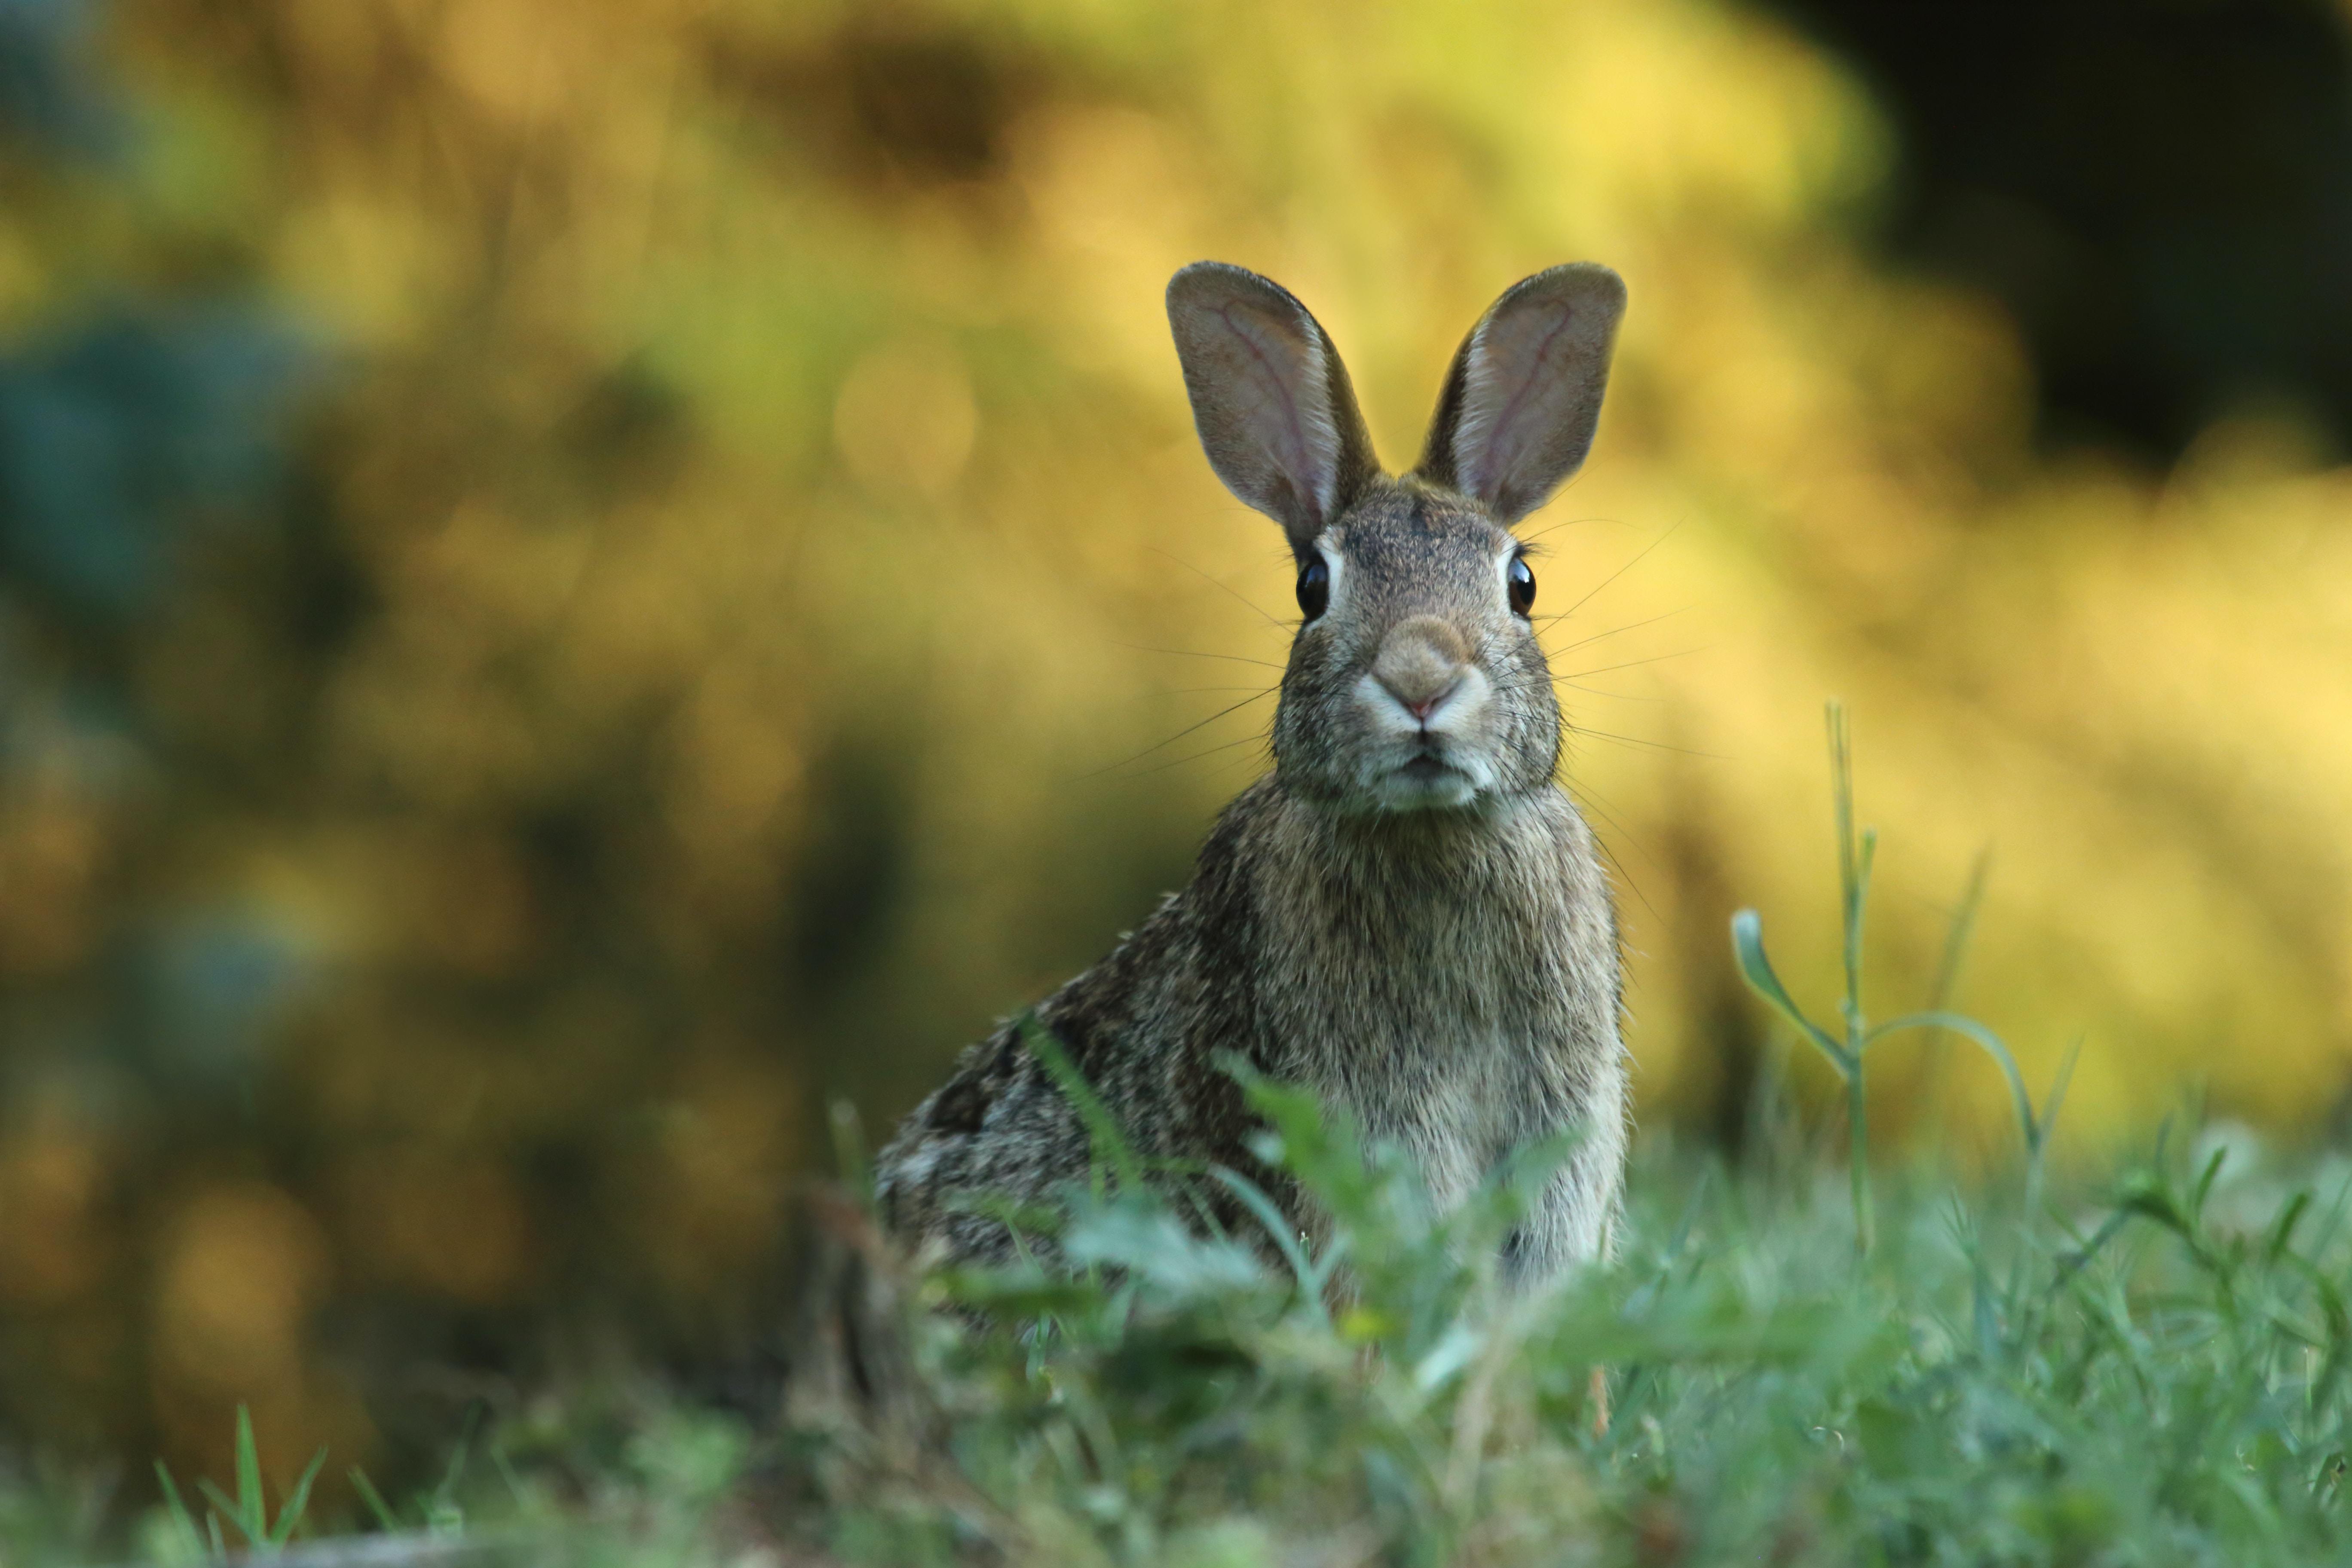 Rabbit Photo from Unplash